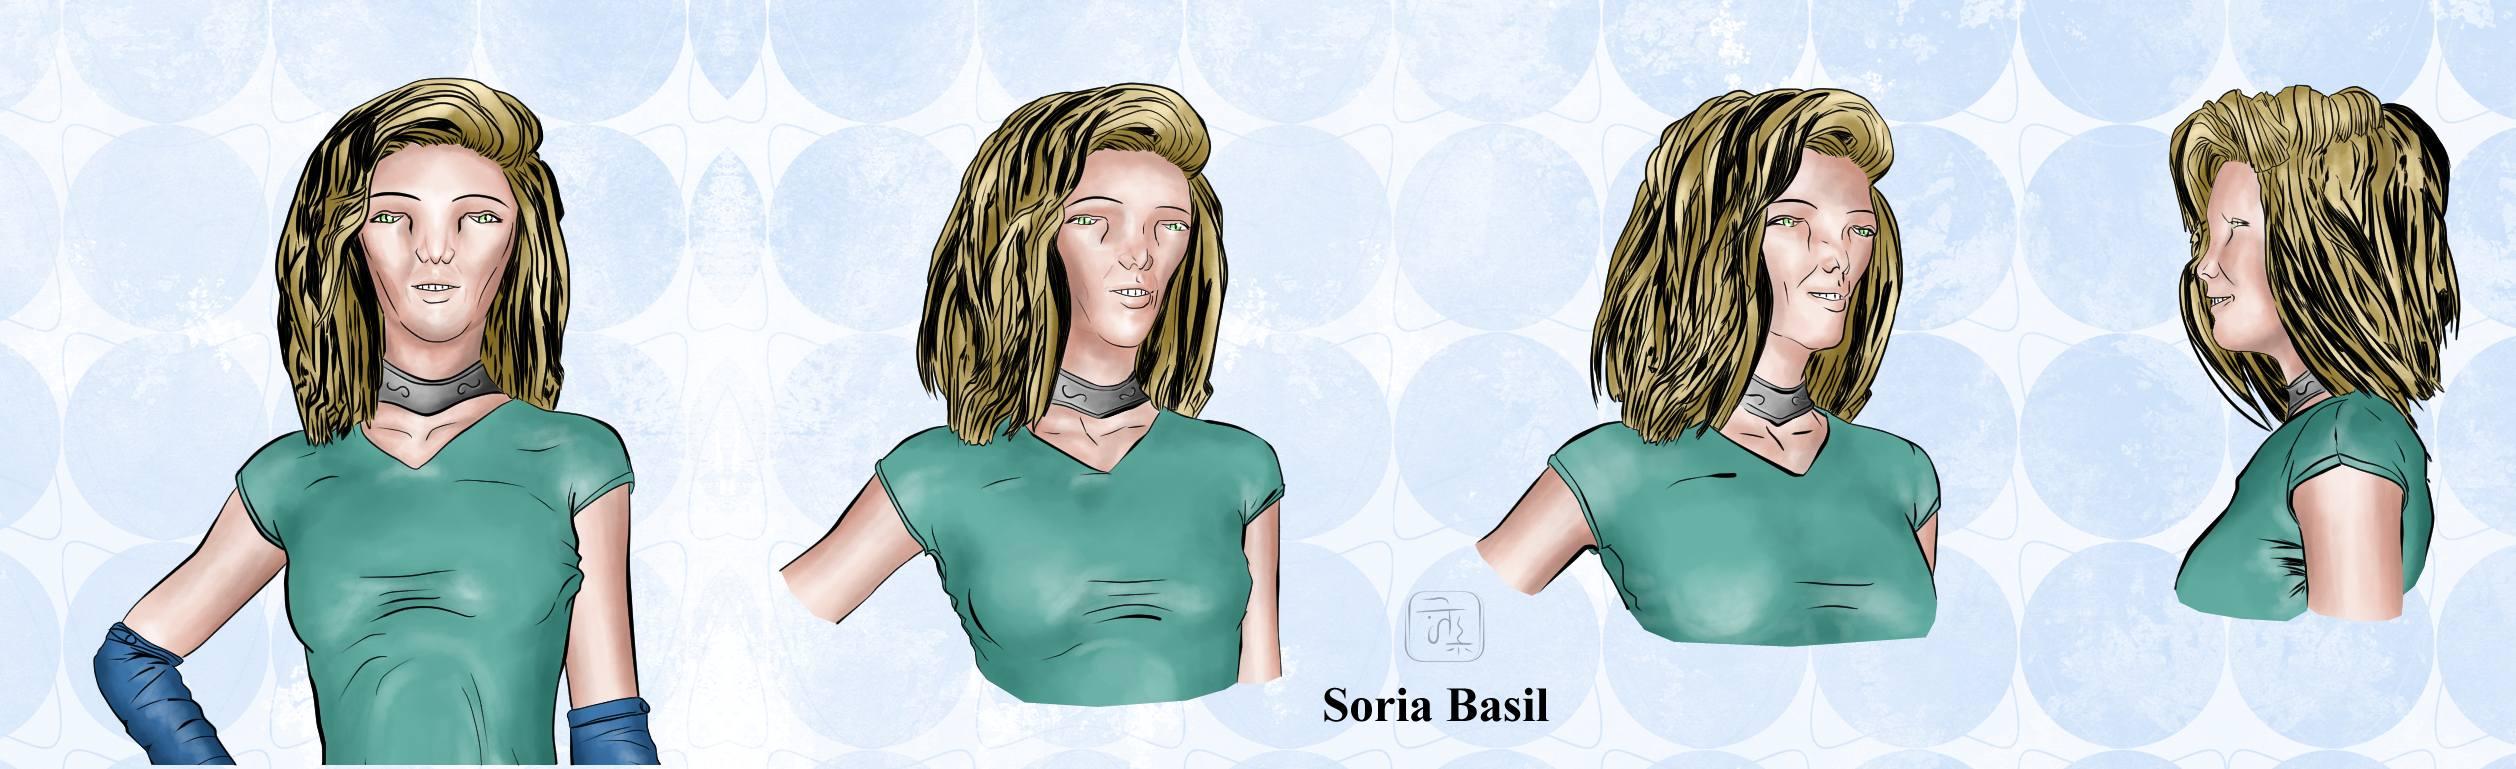 Soria basil - La Grande Onda